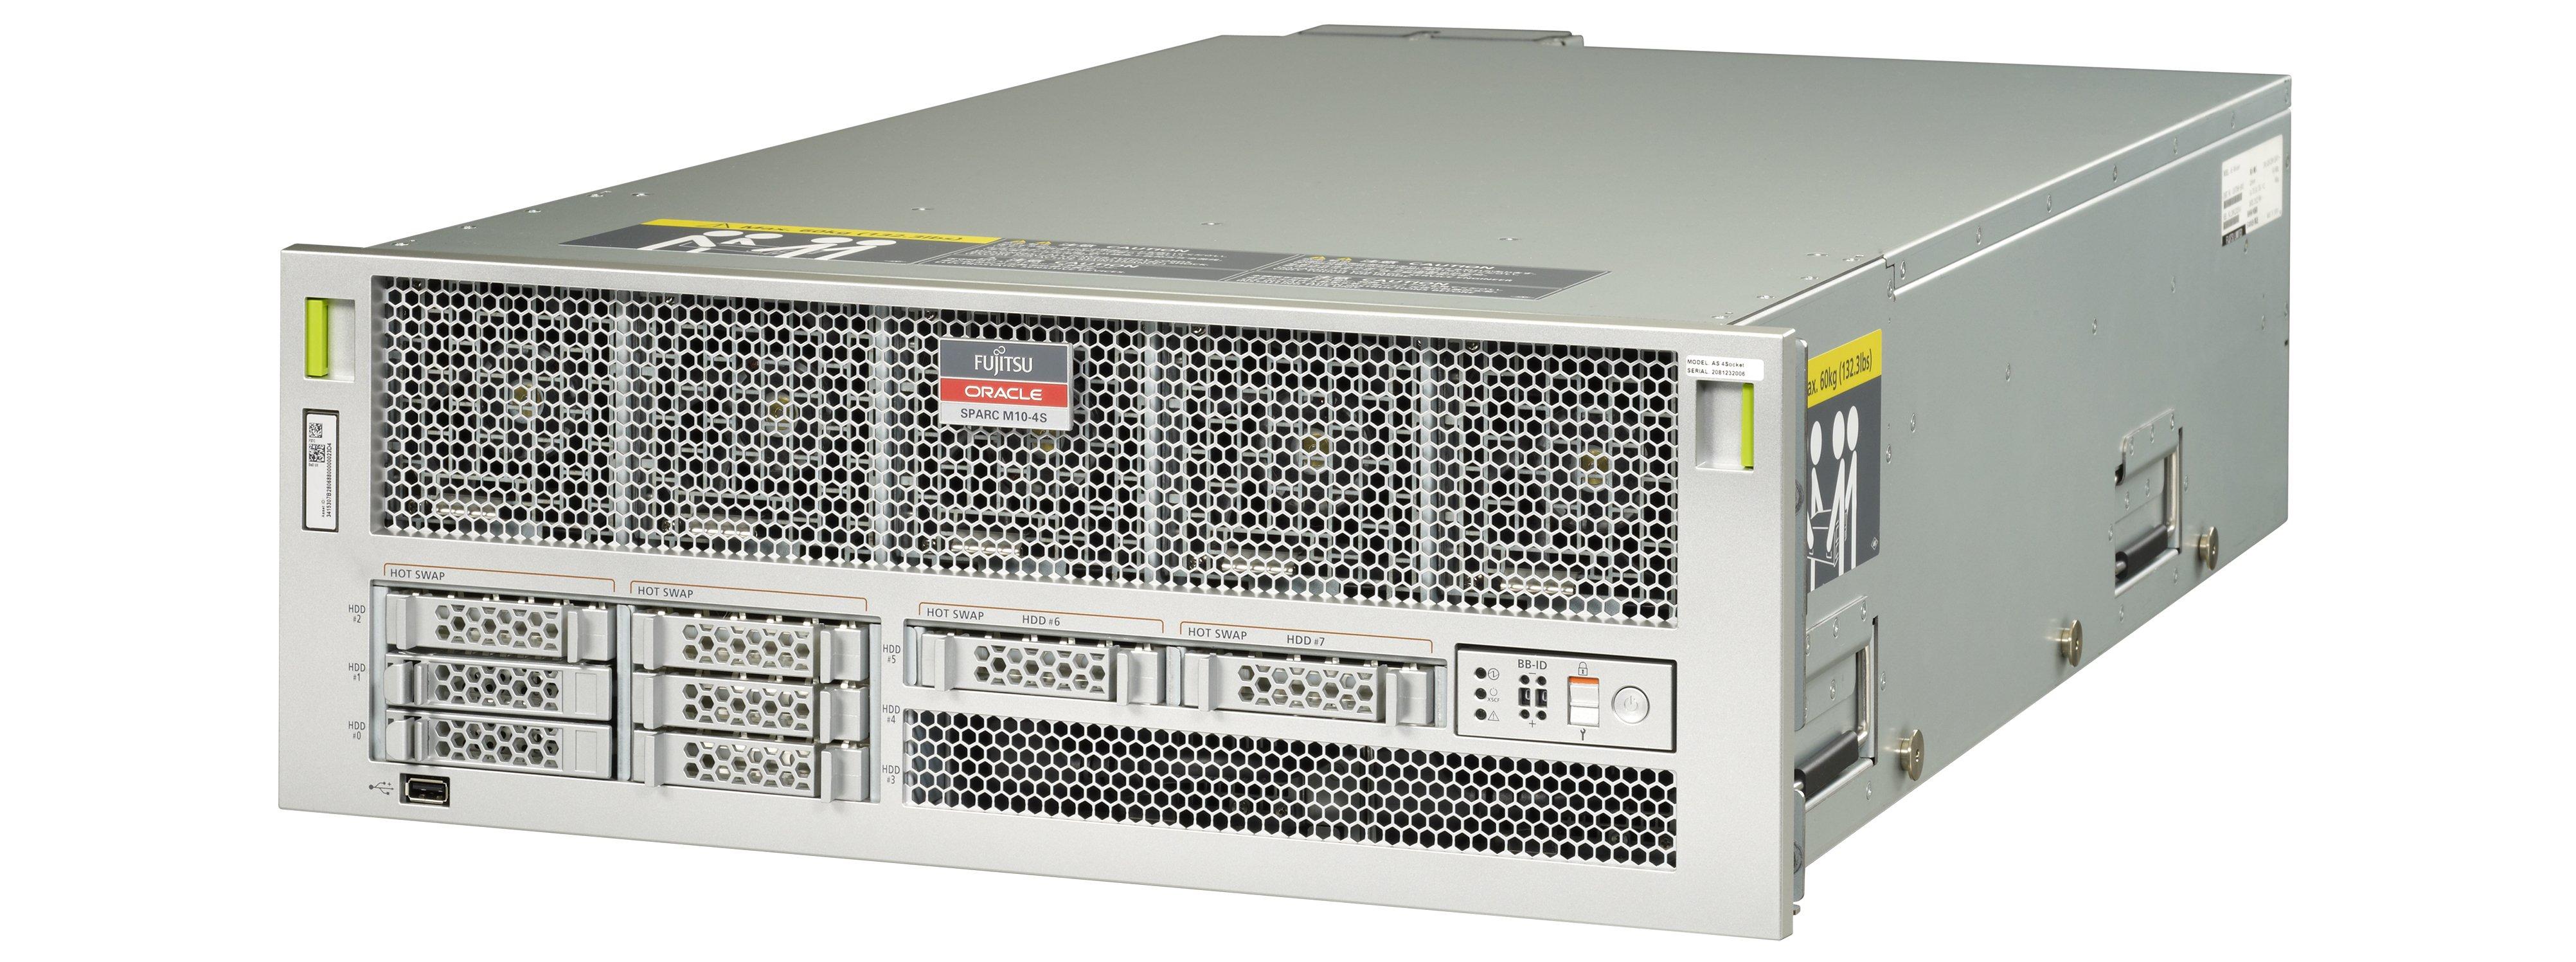 Fujitsu M10-4S